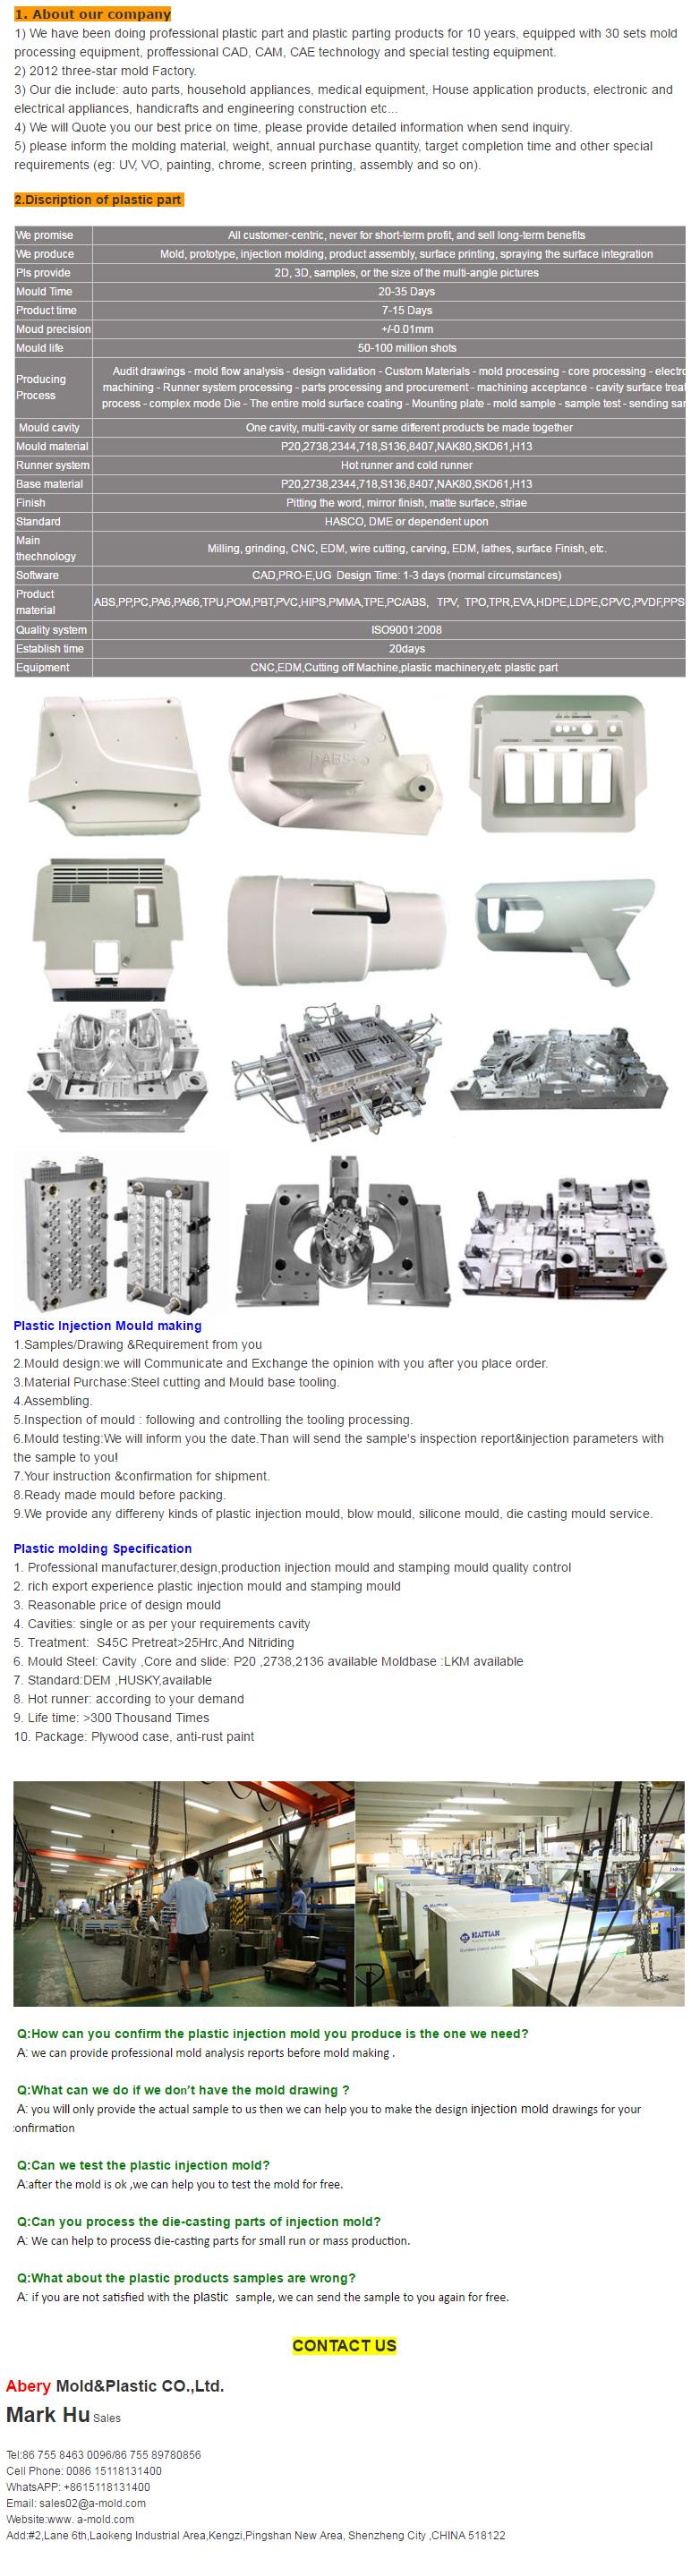 mobile holder mold Customized Details